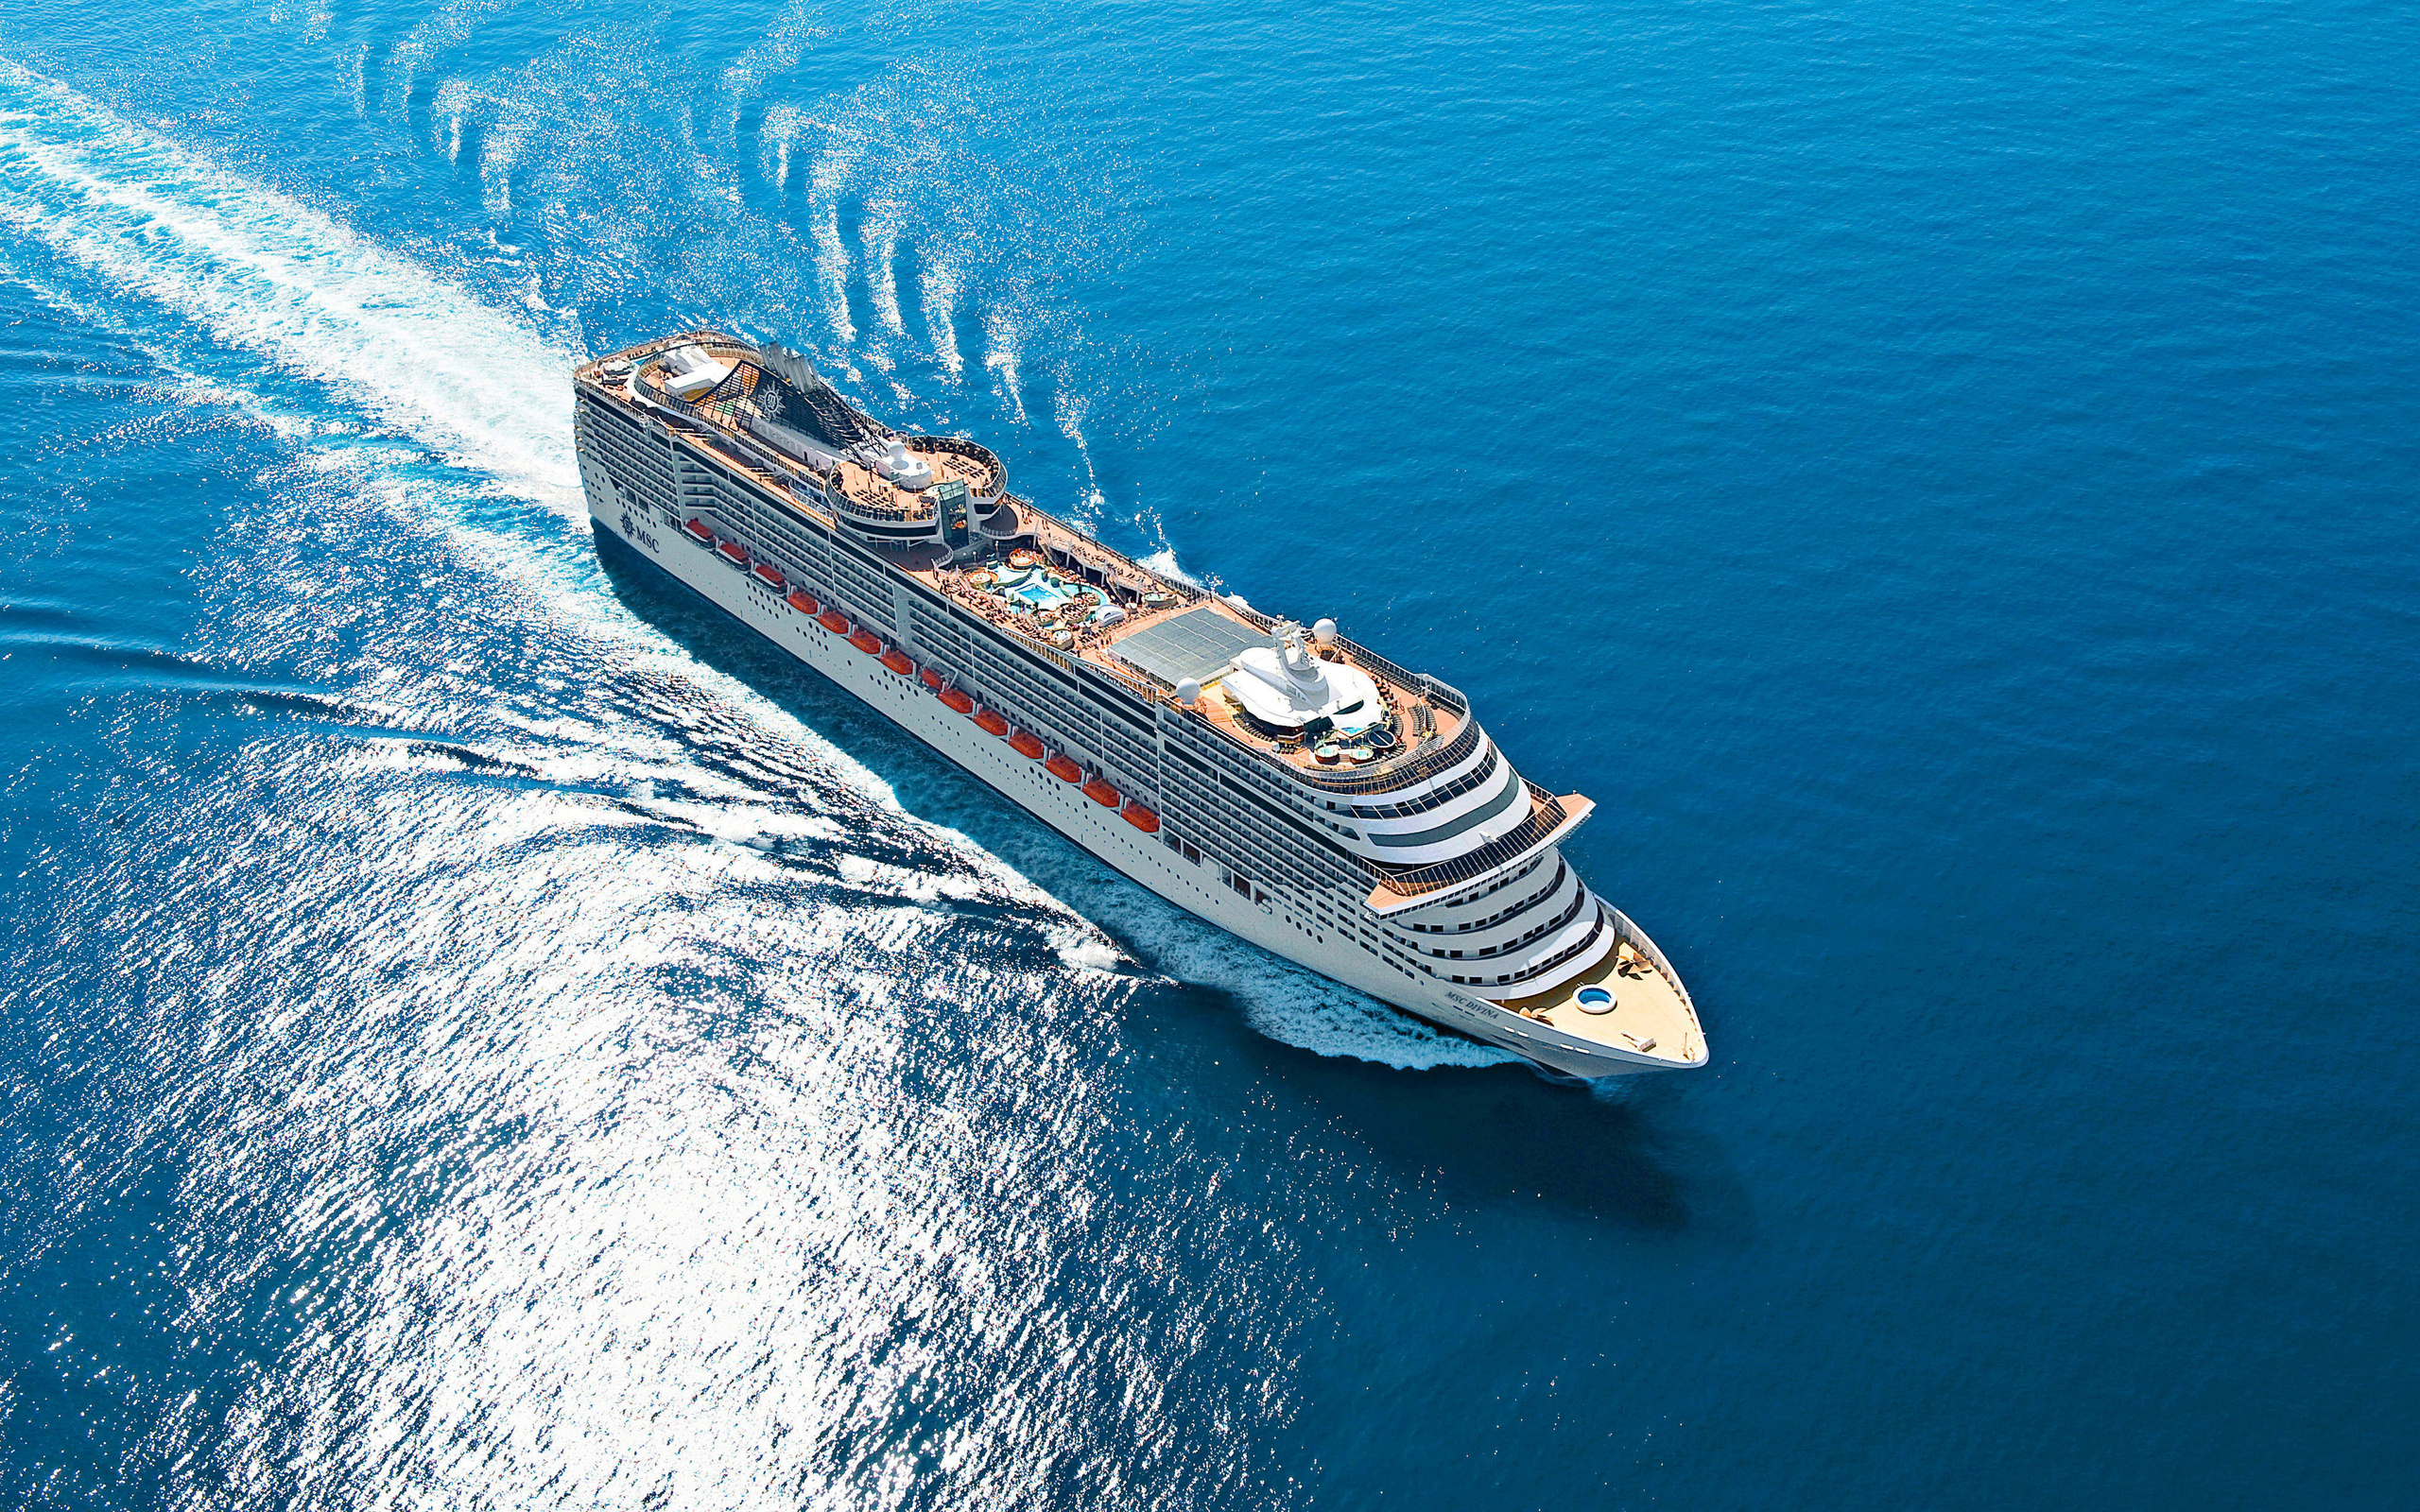 cruise ship wallpaper background 62621